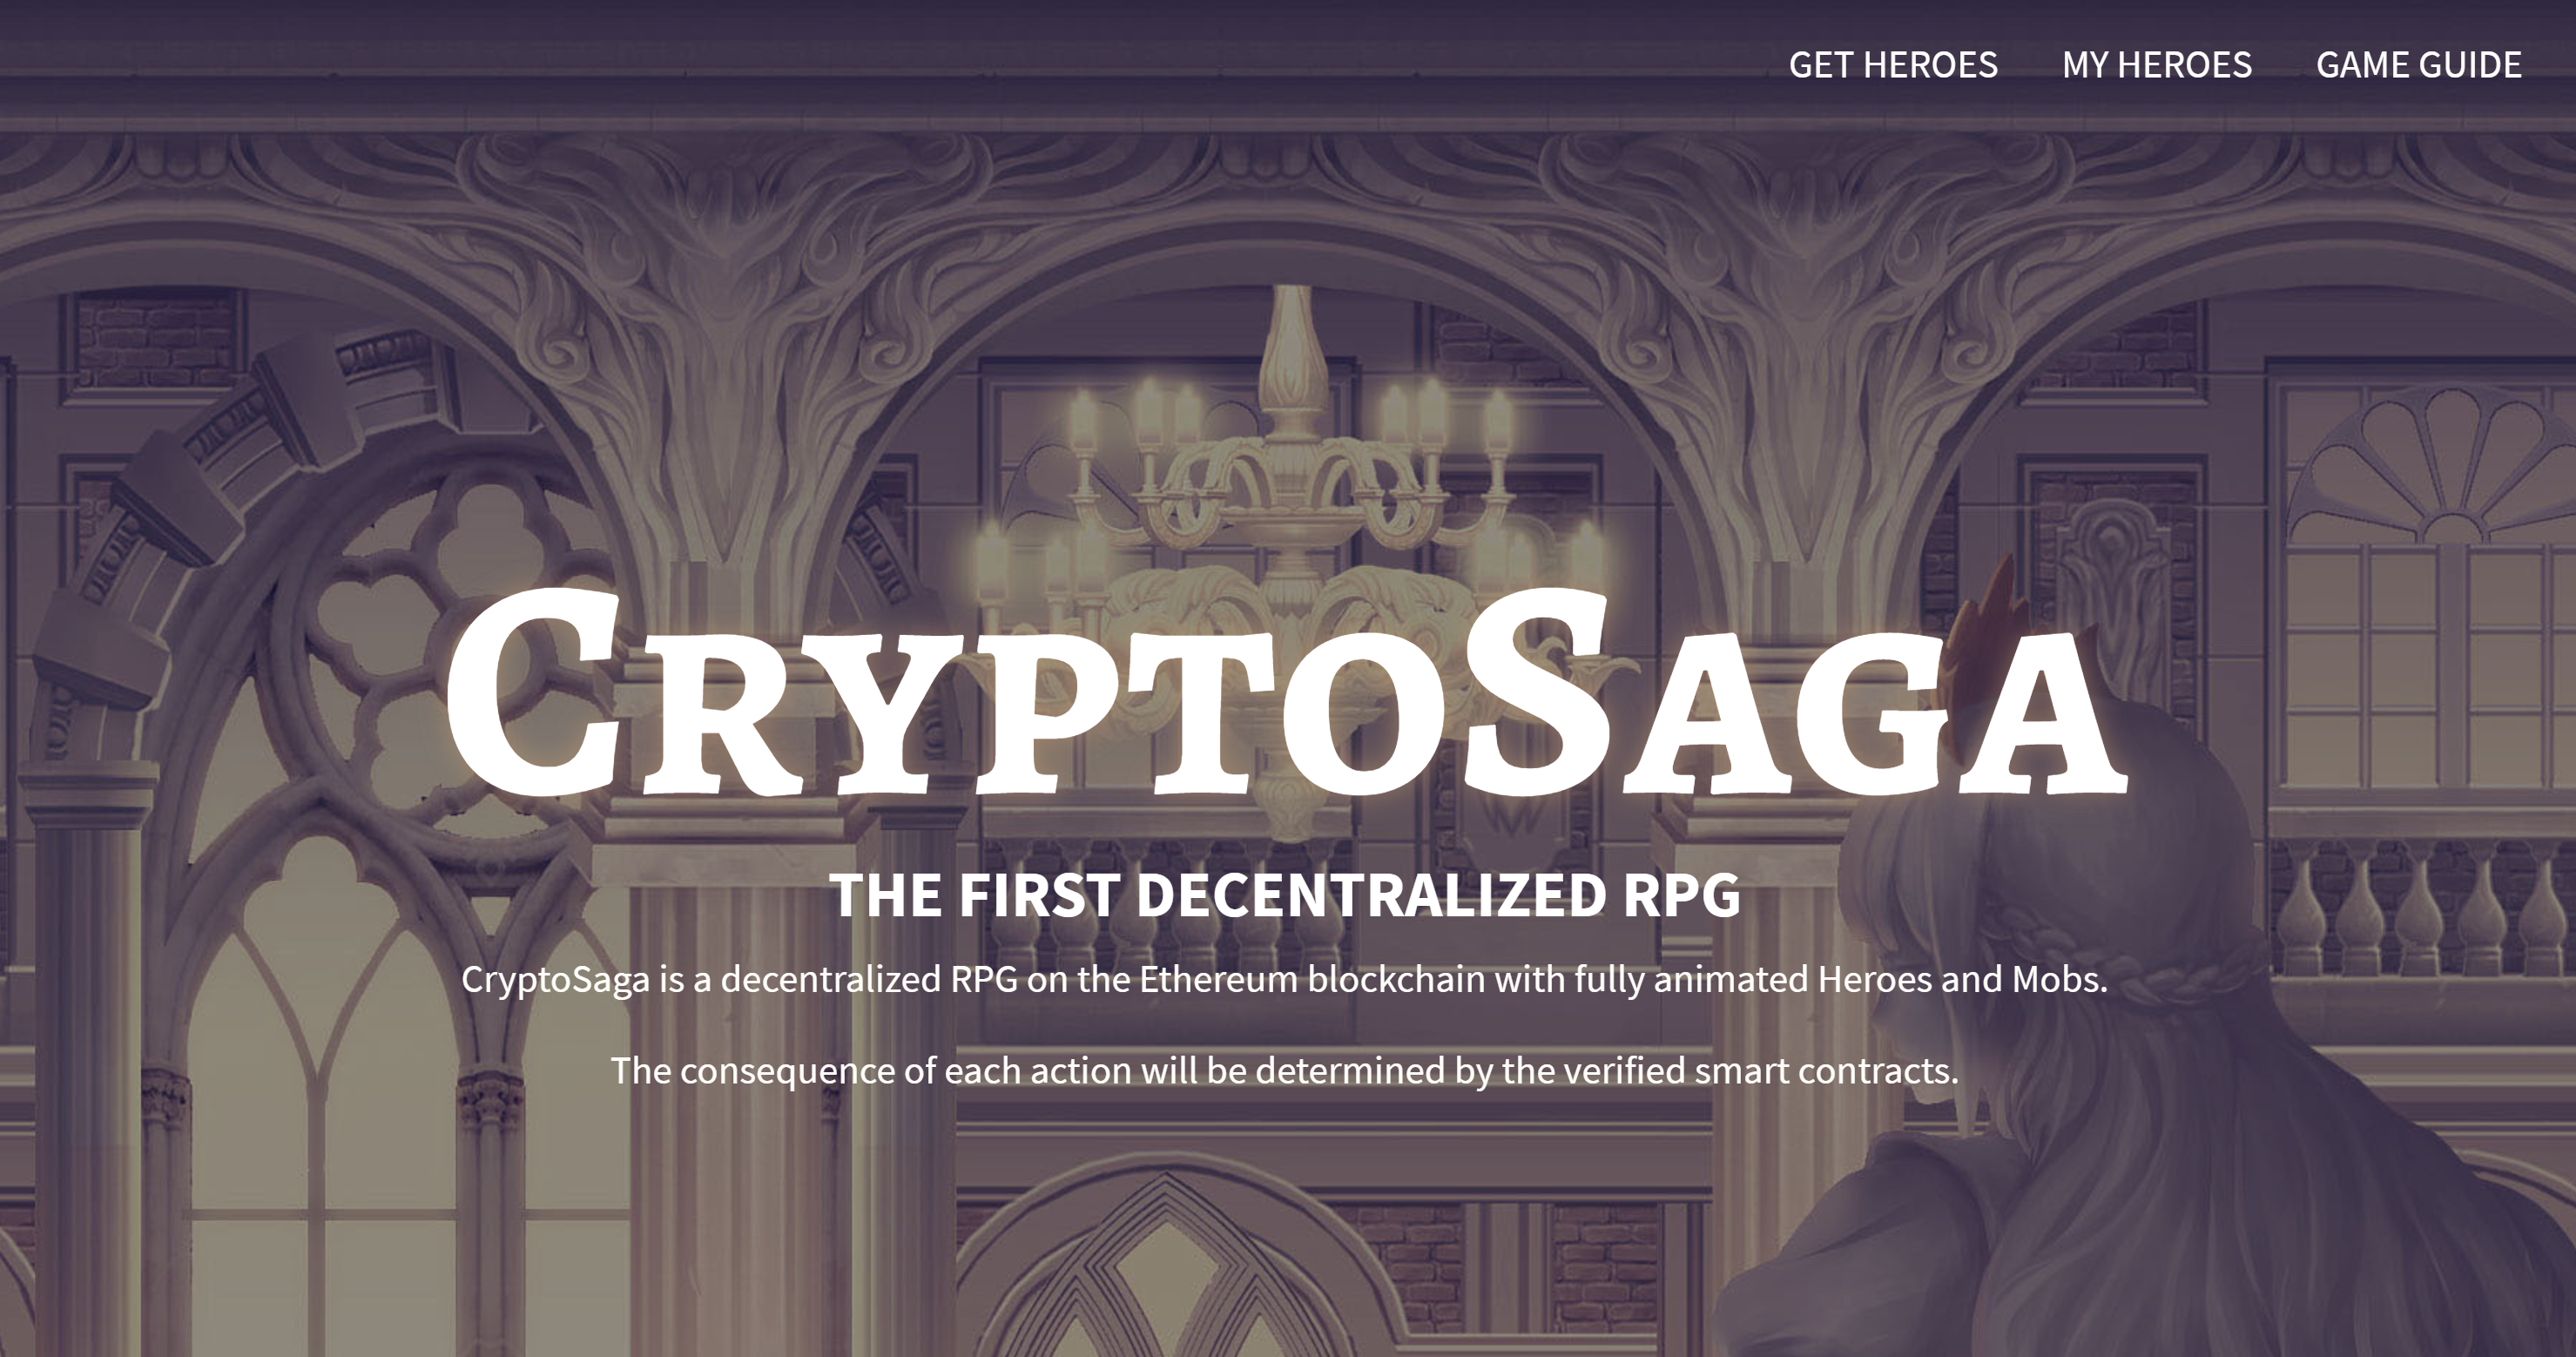 CryptoSaga(クリプトサガ)速報!基本ルールと攻略予想のまとめ